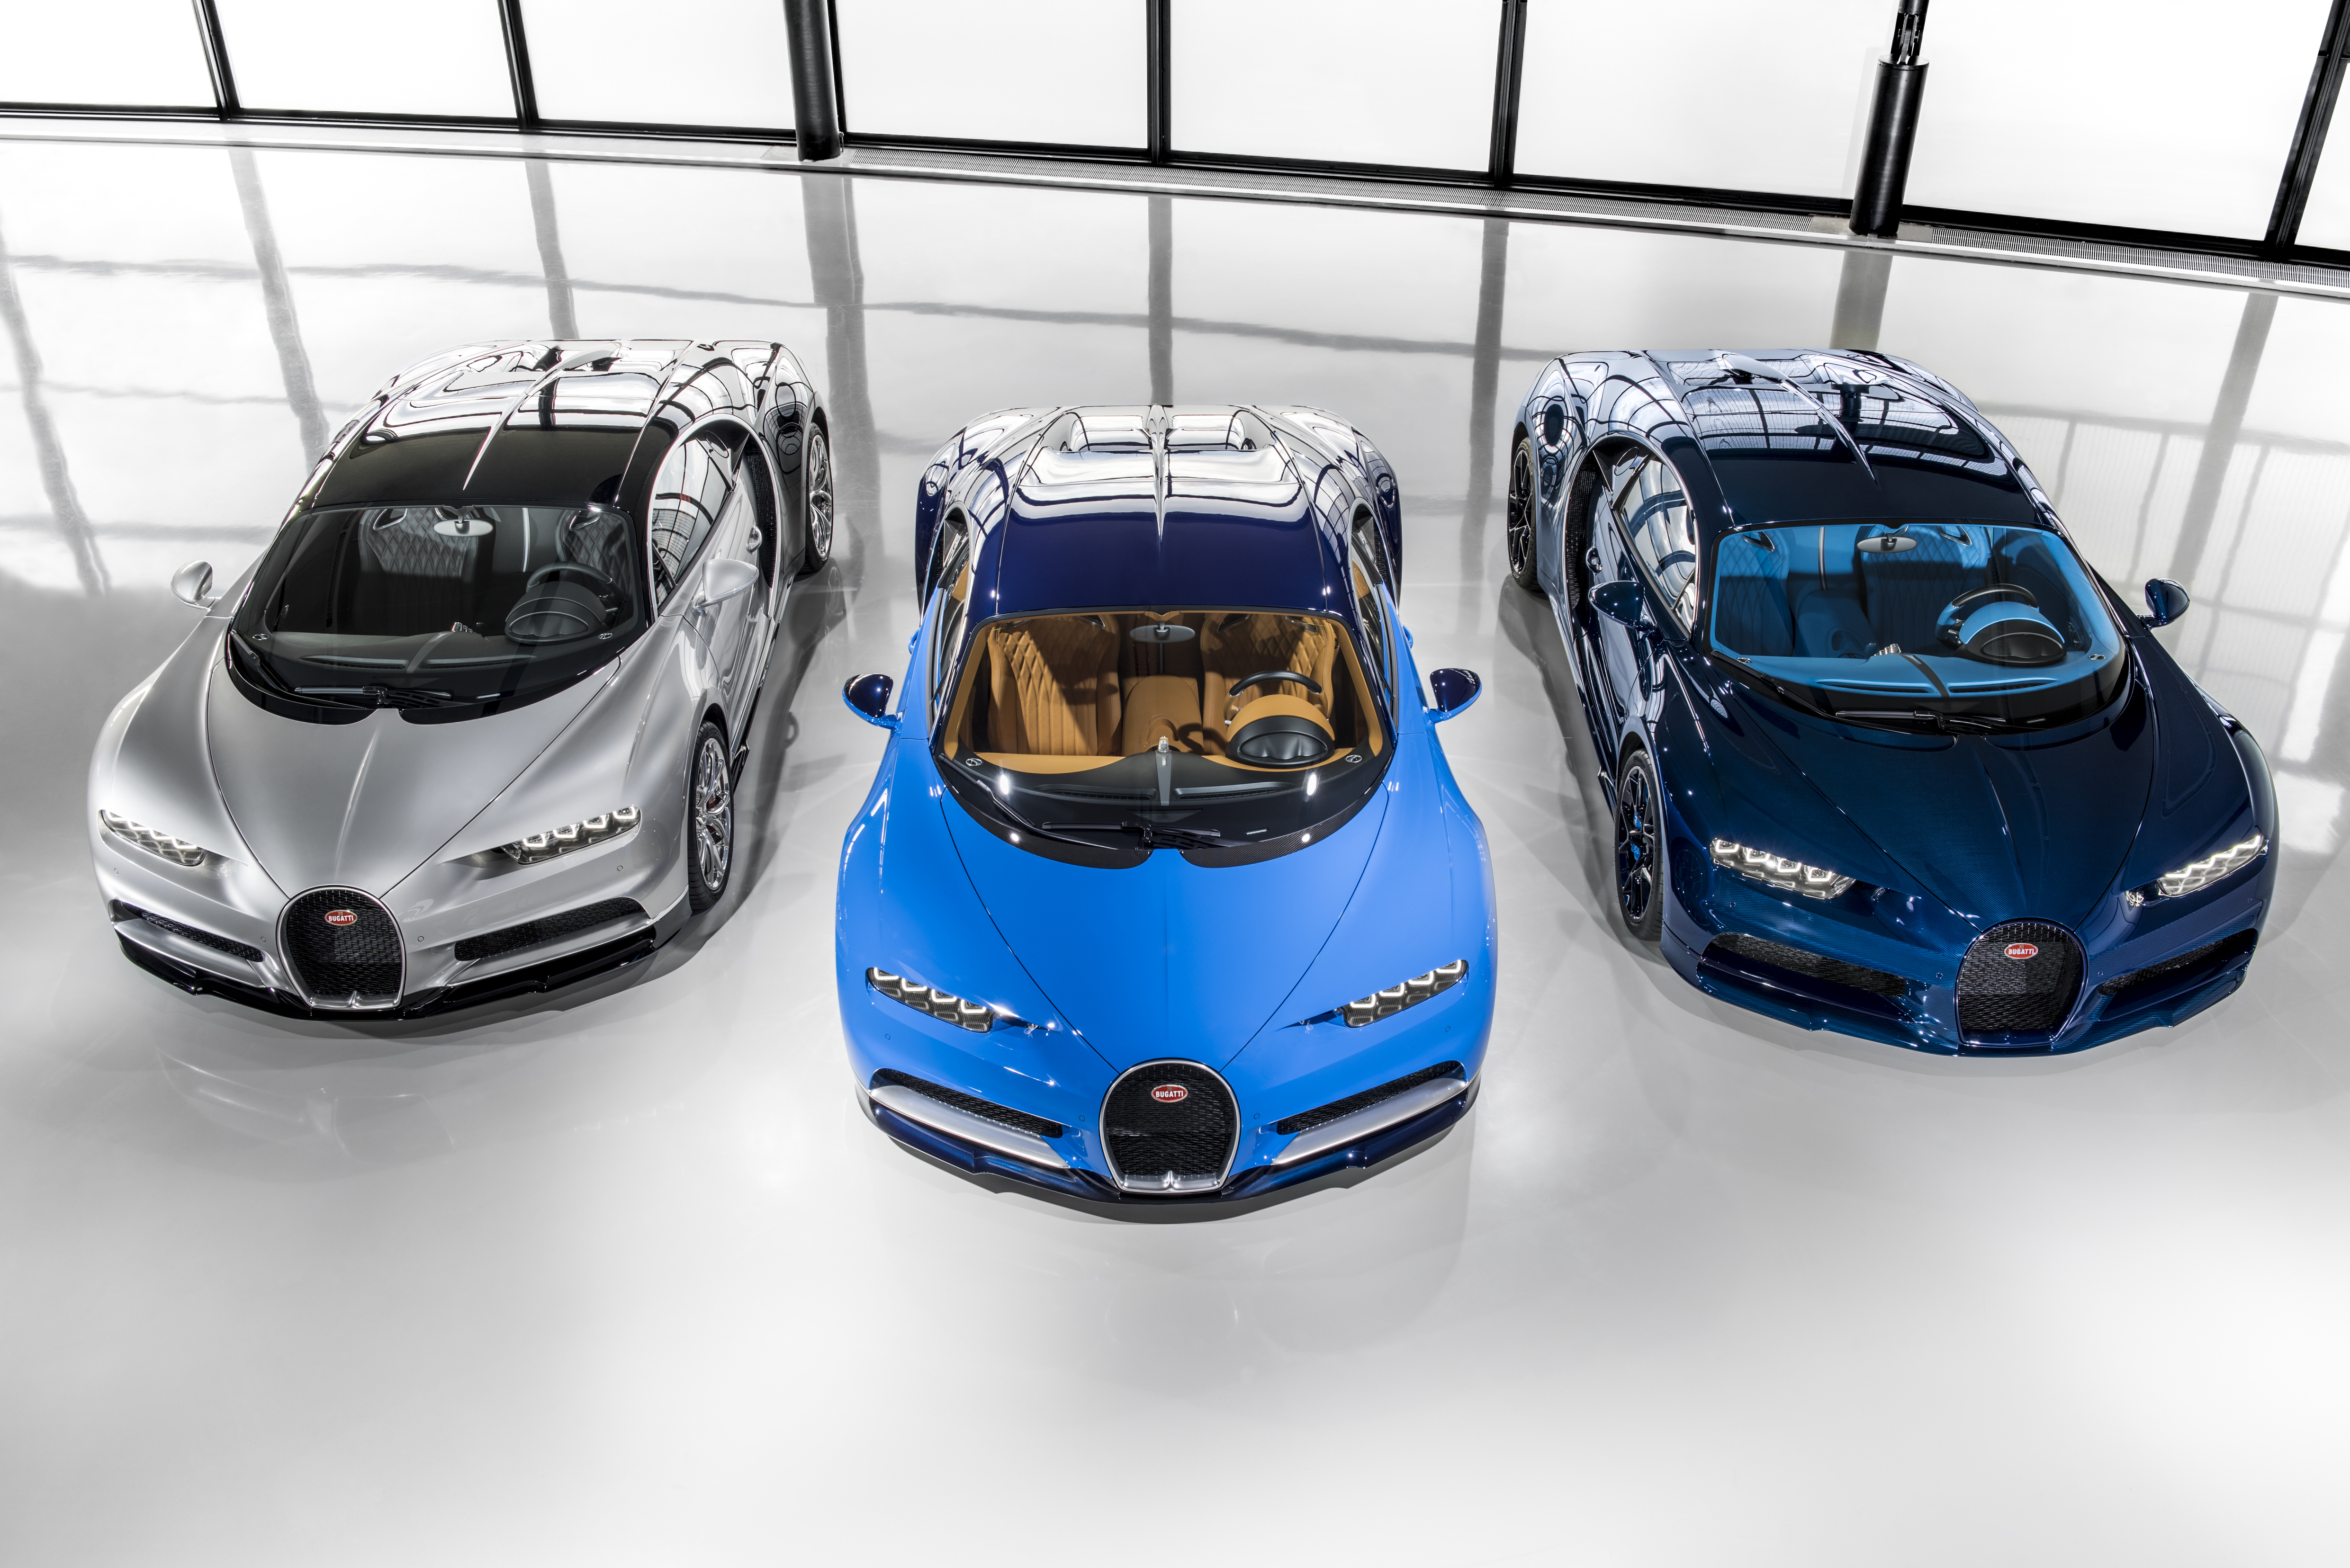 Bugatti Backgrounds, Compatible - PC, Mobile, Gadgets| 4961x3311 px